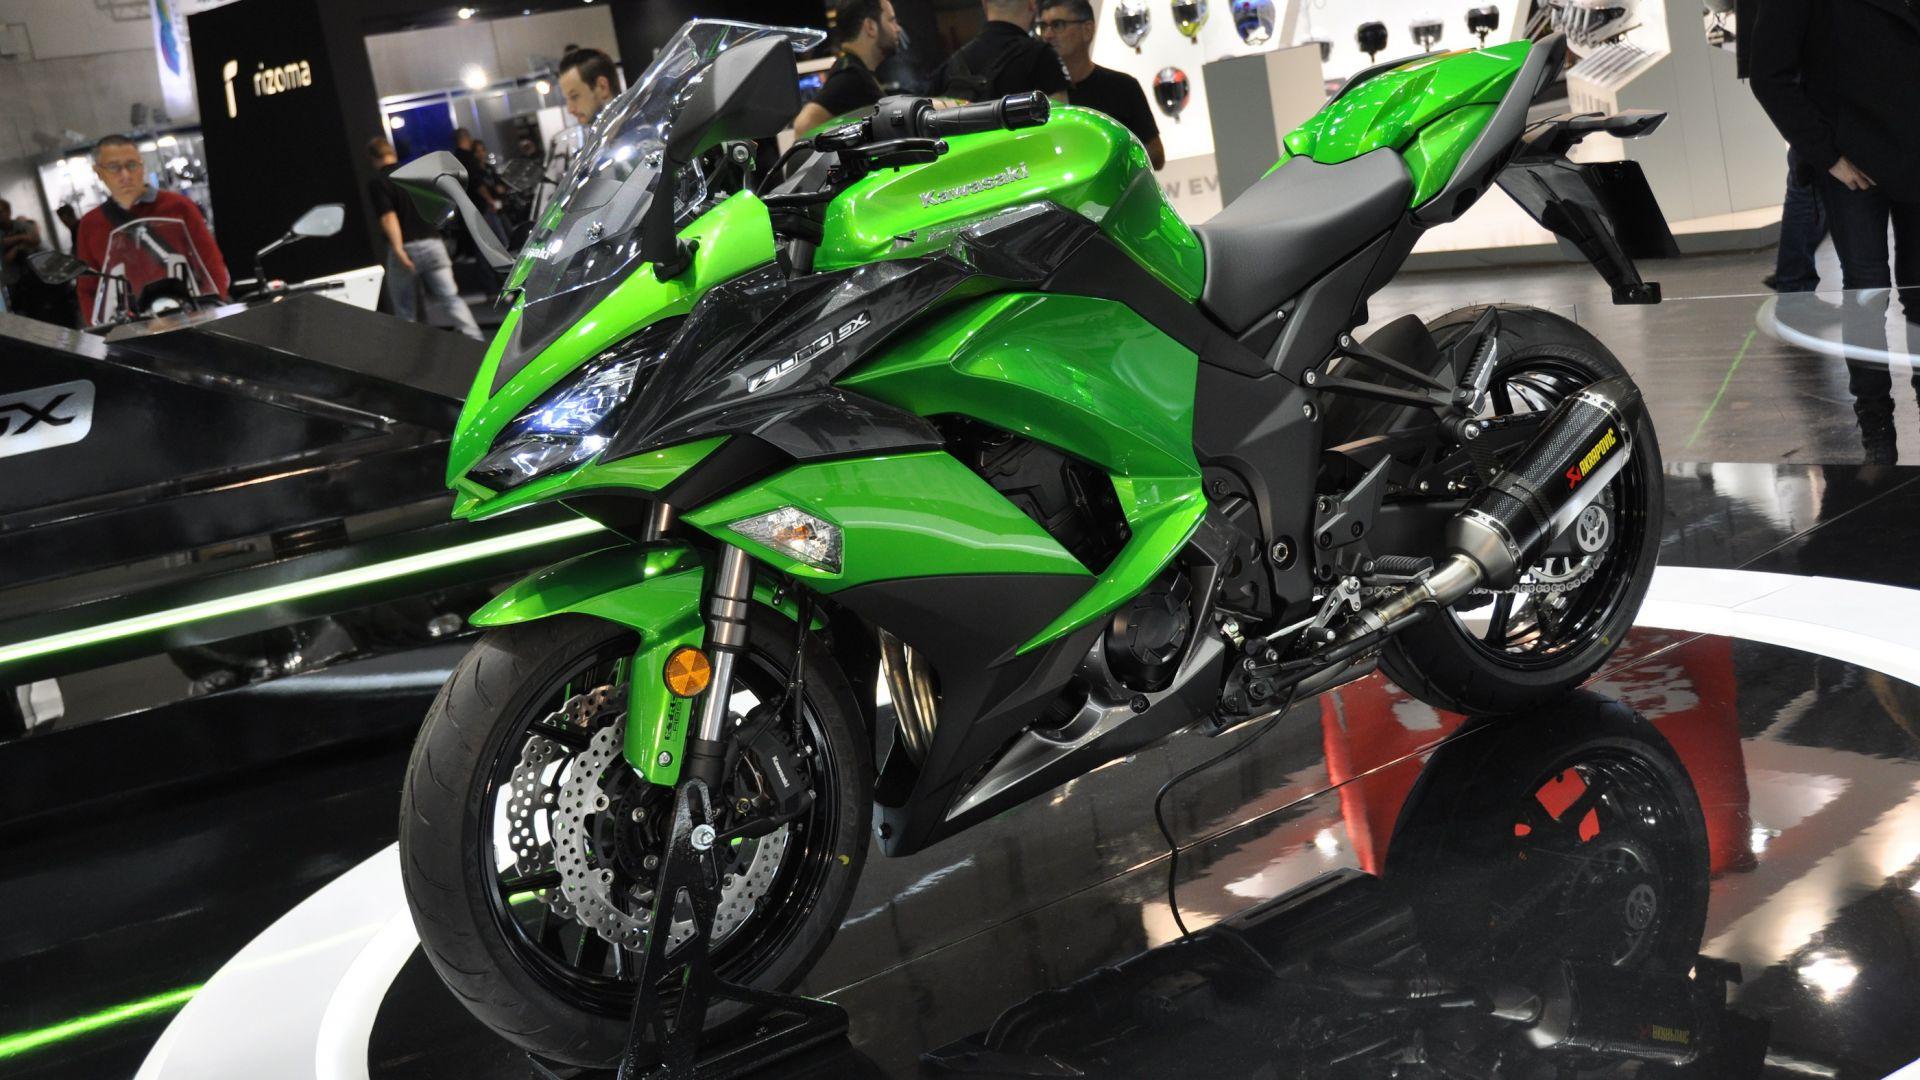 Intermot 2016: Kawasaki Z1000SX 2017, la sport tourer si ...